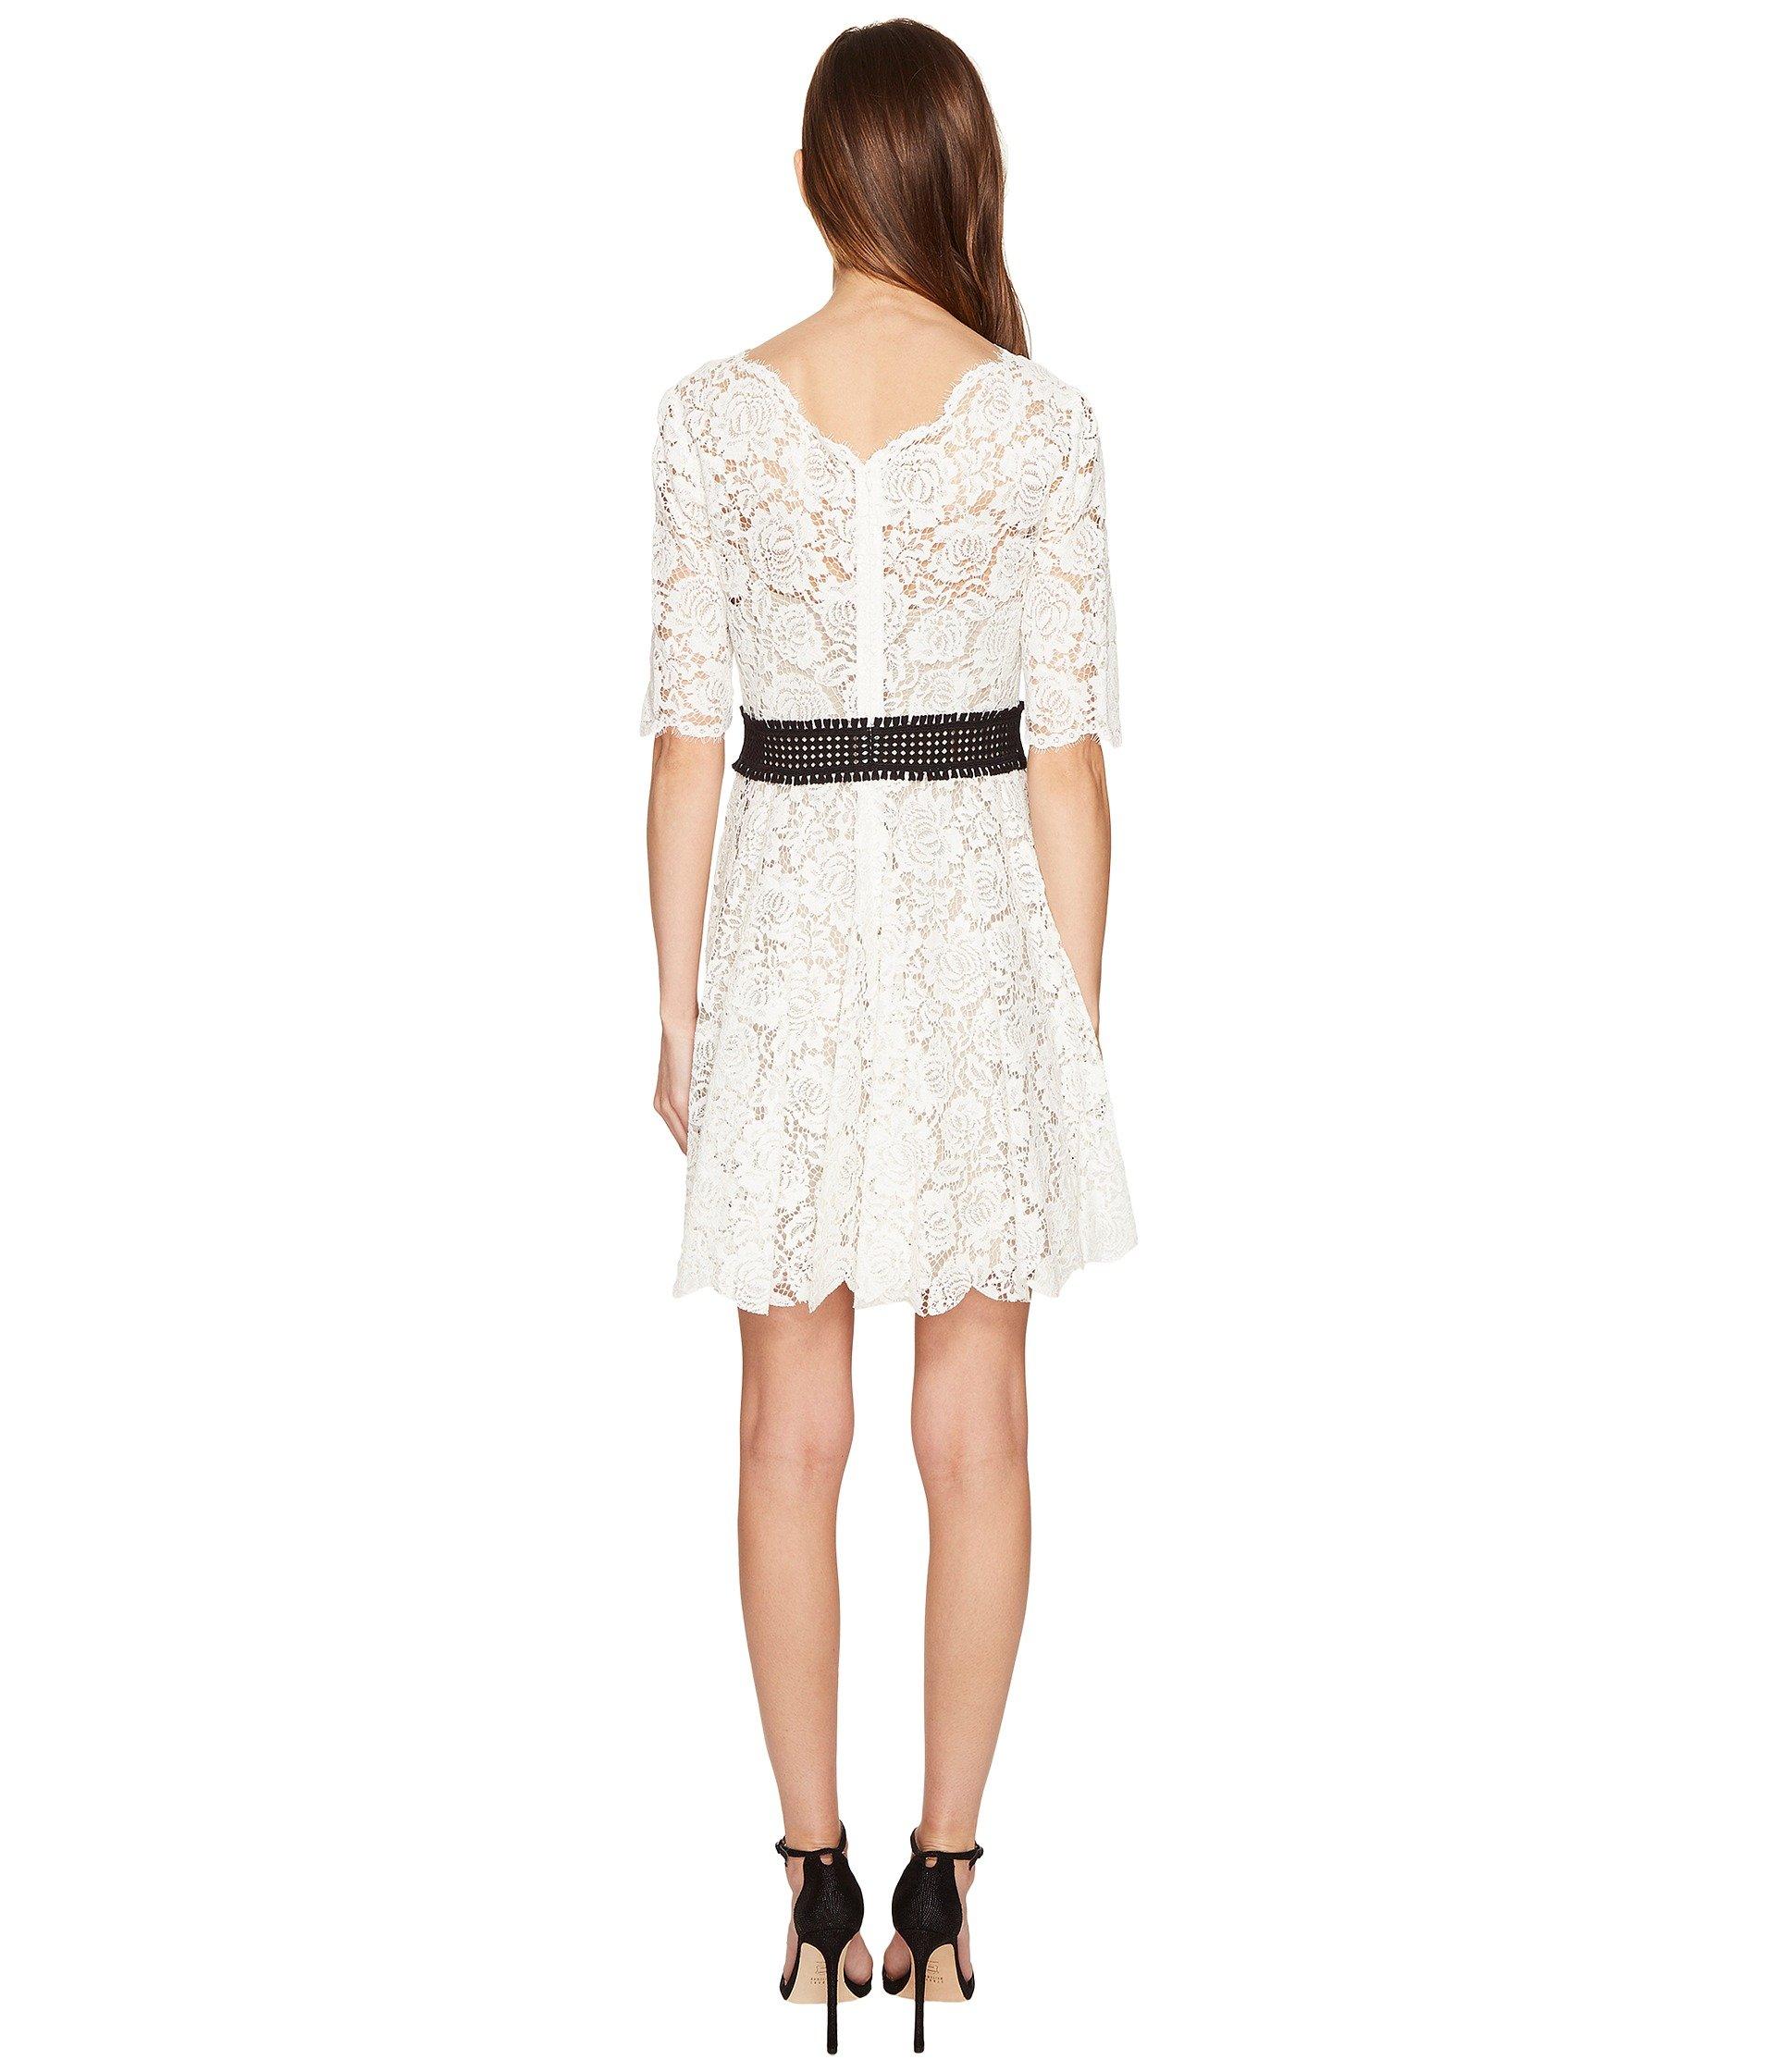 the kooples robe courte tout en dentelle manches longues dress at 6pm. Black Bedroom Furniture Sets. Home Design Ideas